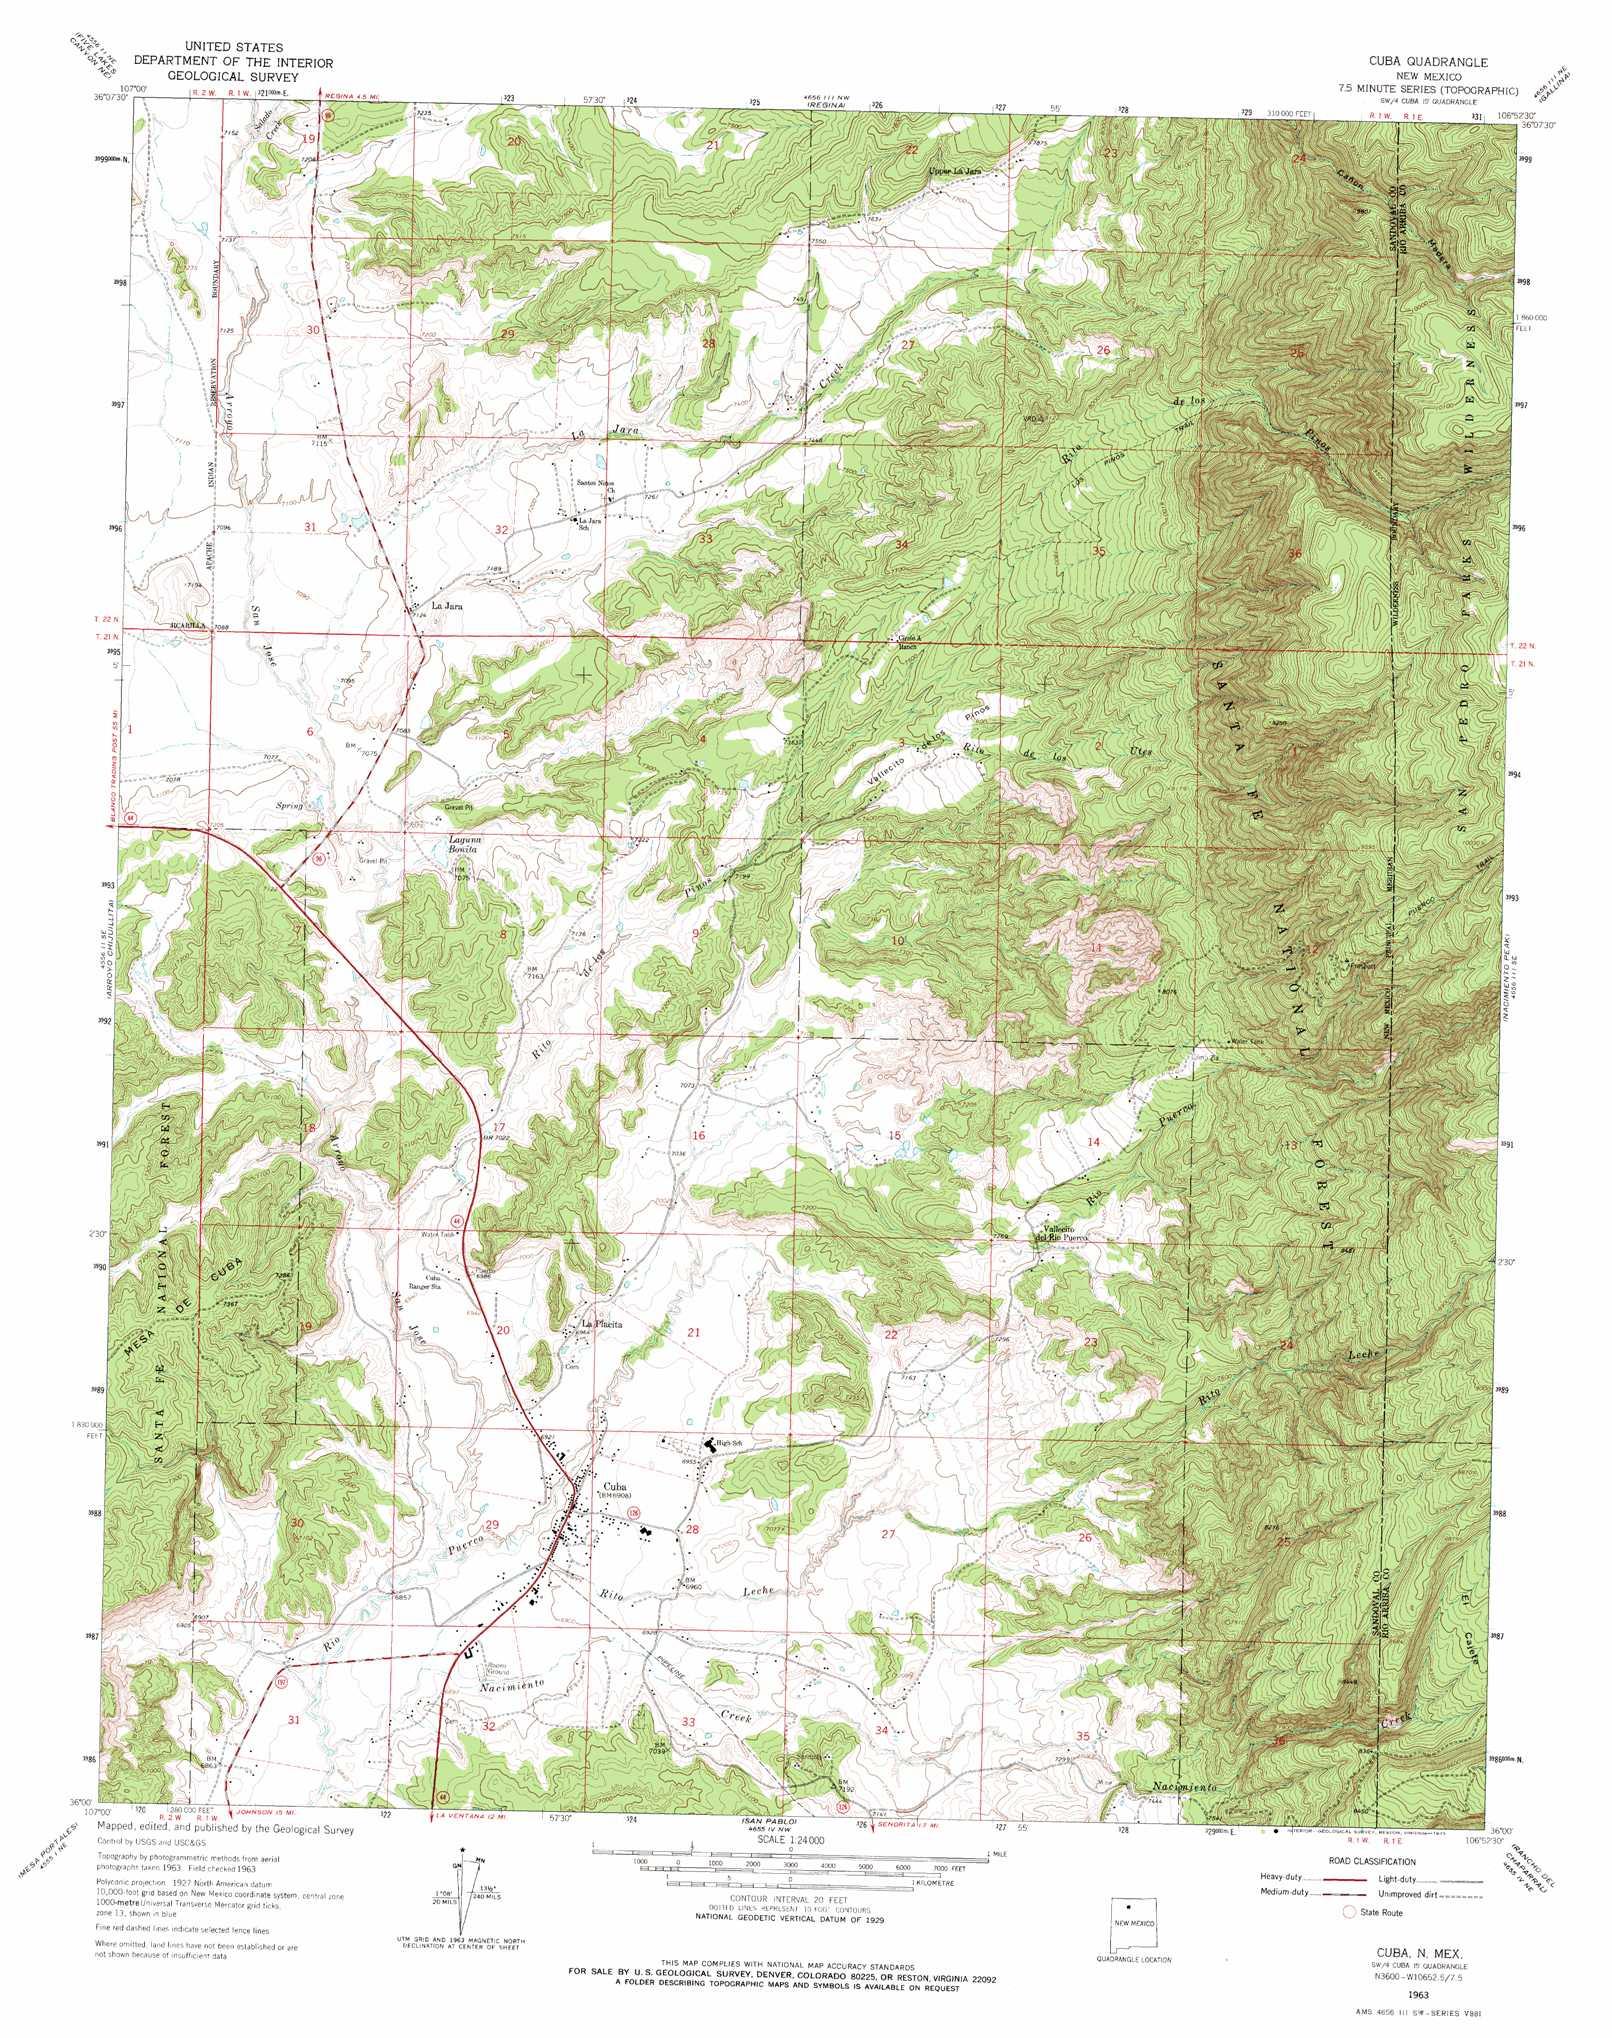 Cuba Topographic Map Nm Usgs Topo Quad 36106a8